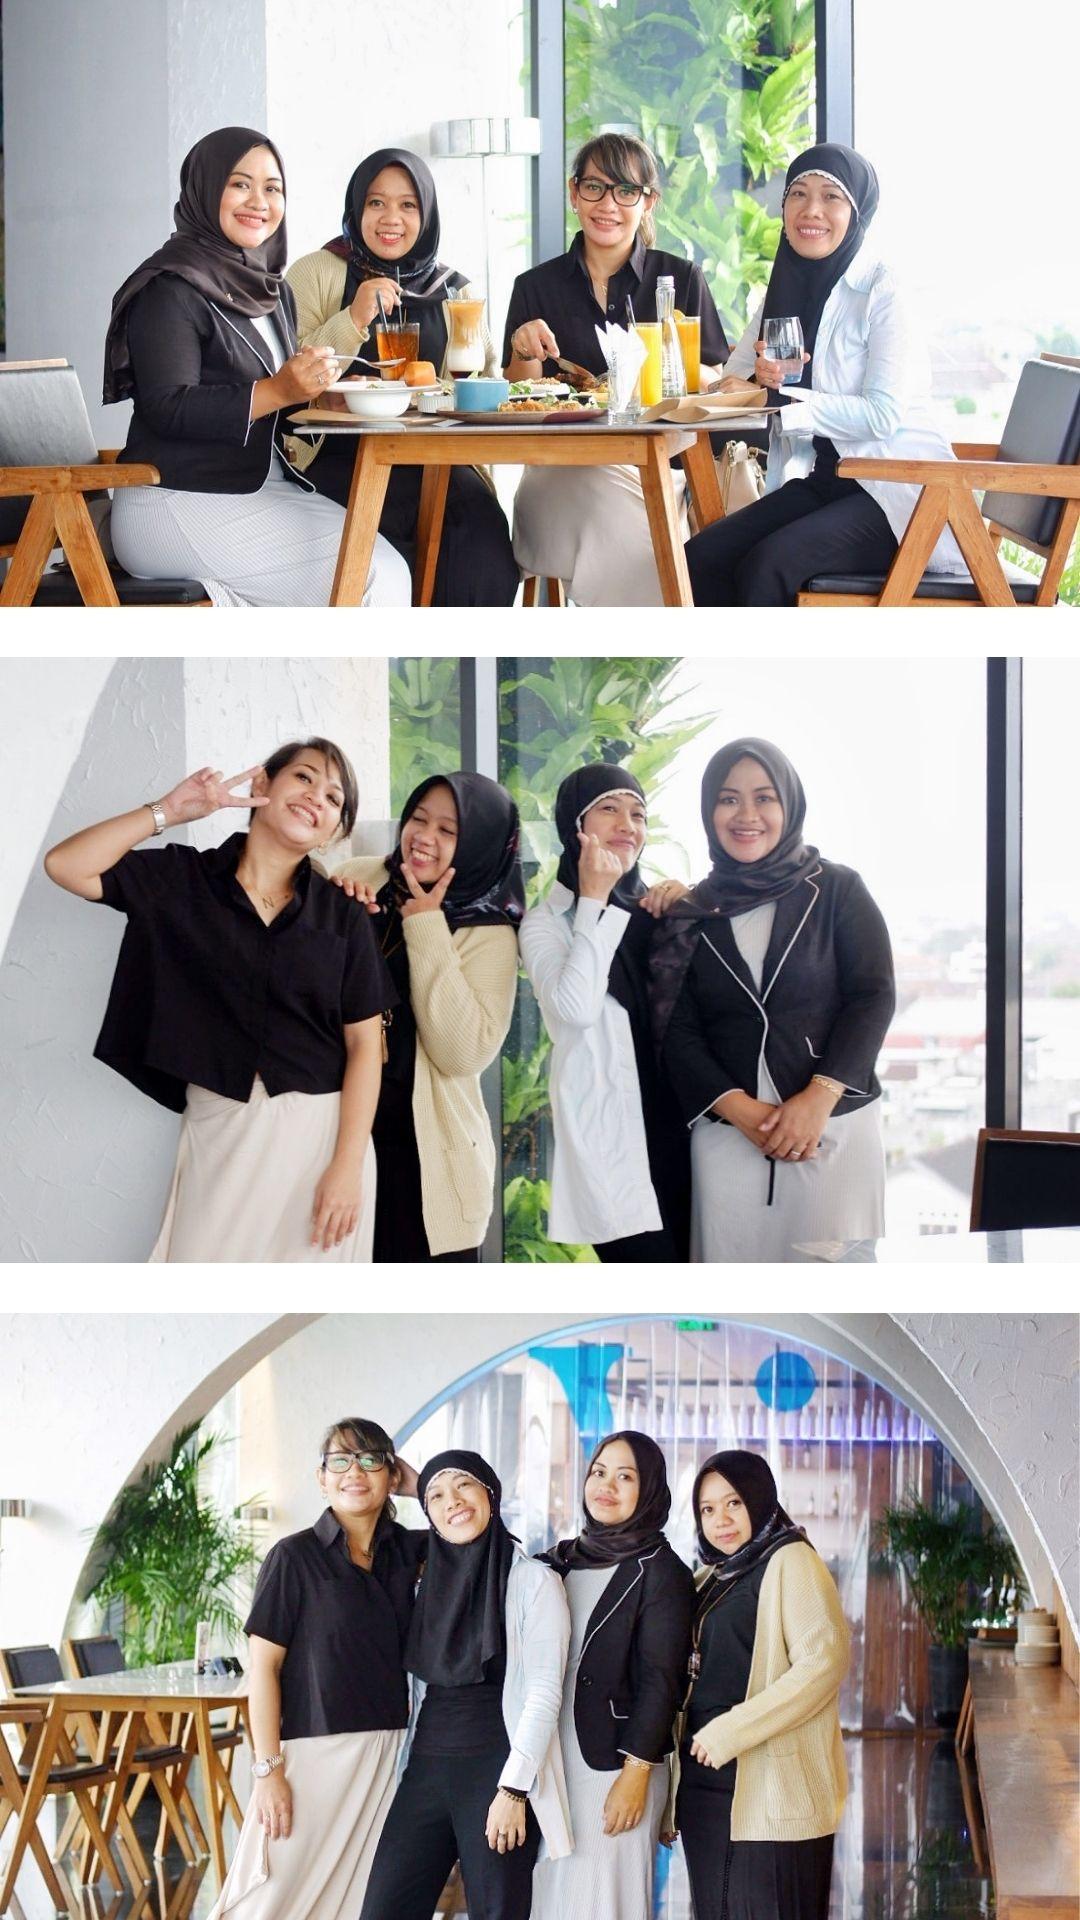 enjoyed-vanilla-sky-lounge-grand-aston-hotel-yogyakarta-with-best-friends